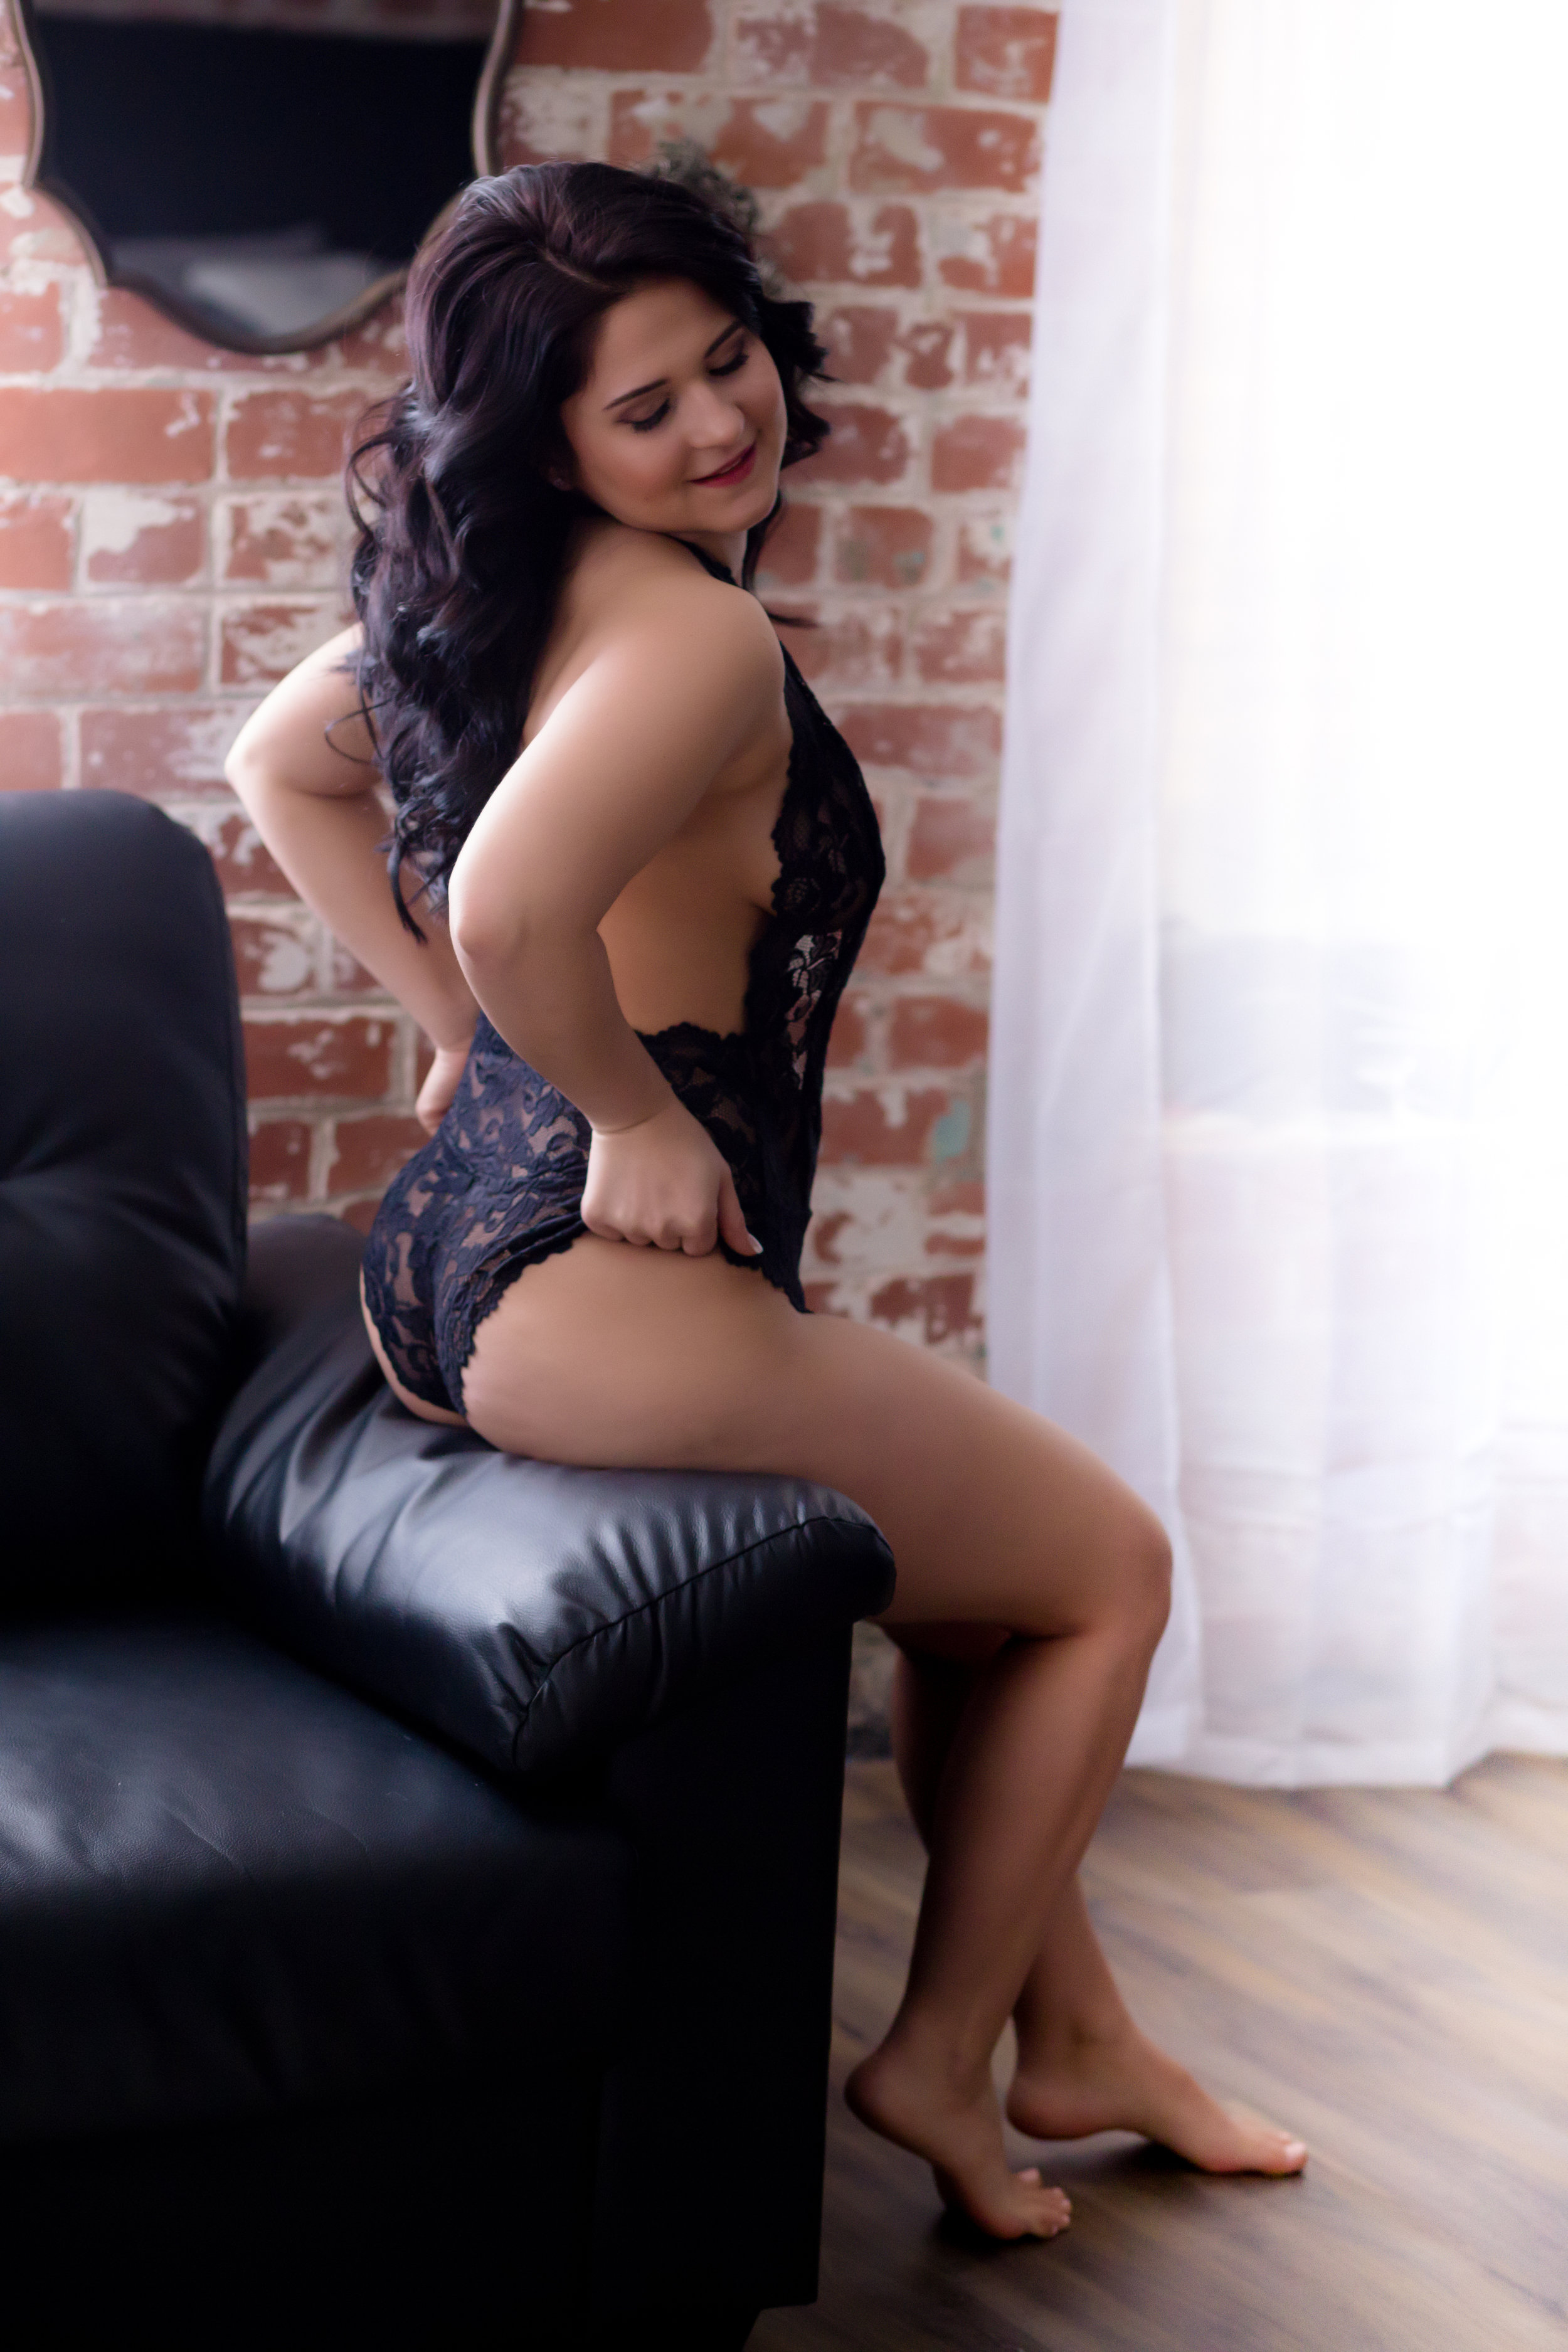 ohio boudoir photographer, sexy photo shoot, lingerie pics, bridal grooms gift, christmas gift ideas for men, intimate womens photographer columbus ohio